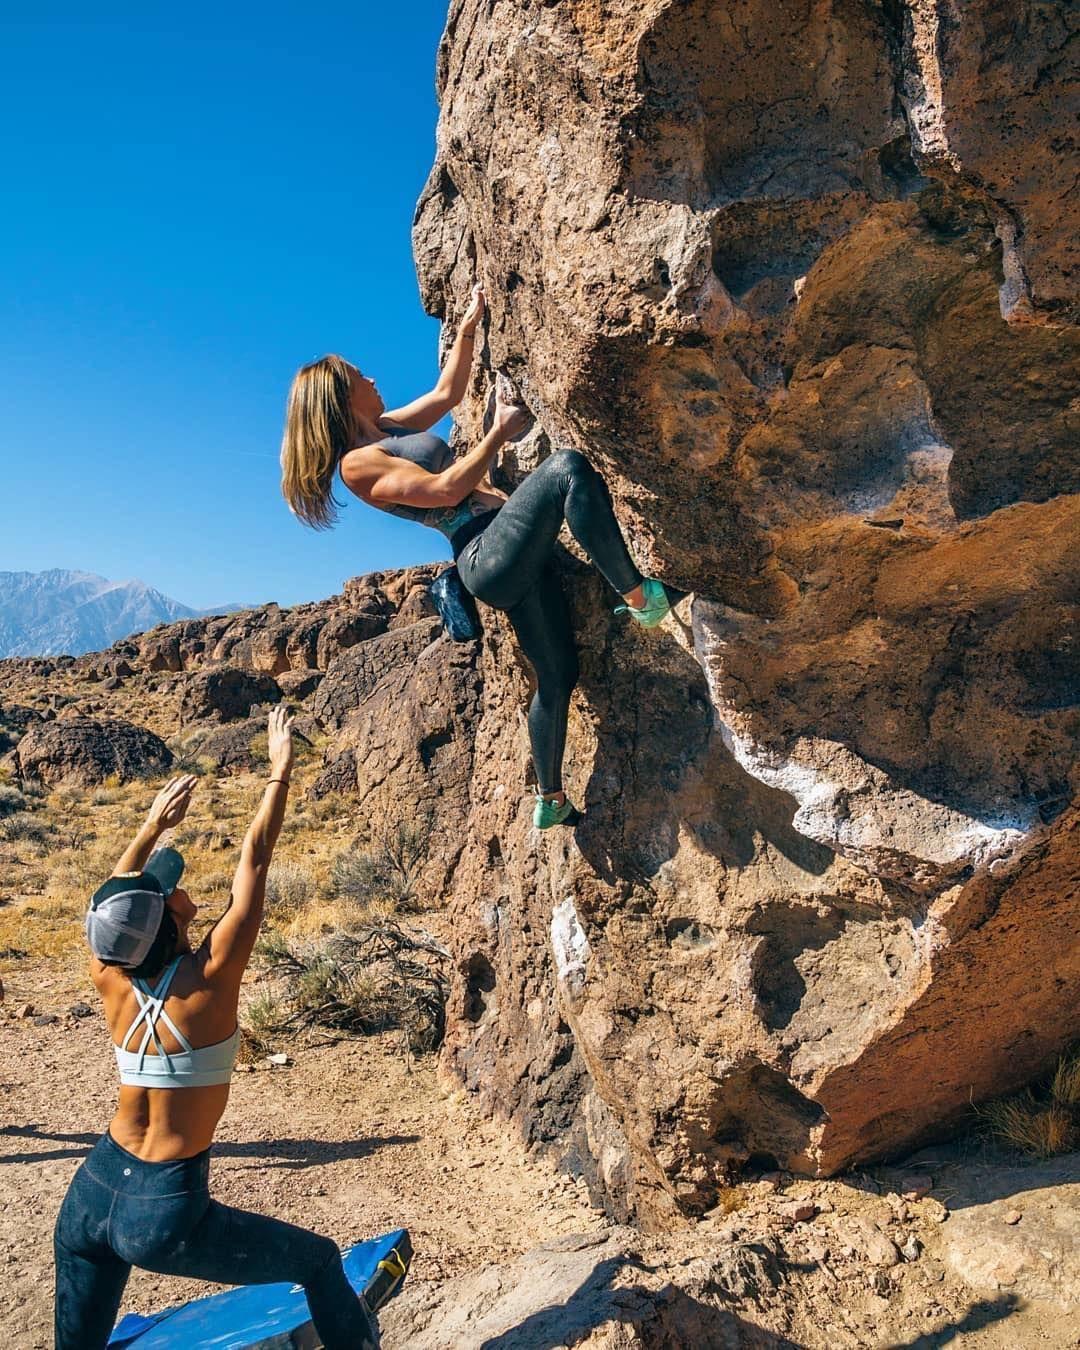 da806814df So iLL Ladies Leggings |Shimmer | Climbing Shoes - Street LV | worn by  @yeahapril @takeholdlv #climb #climbing #bouldering #girlswhoclimb  #climbing shoes ...